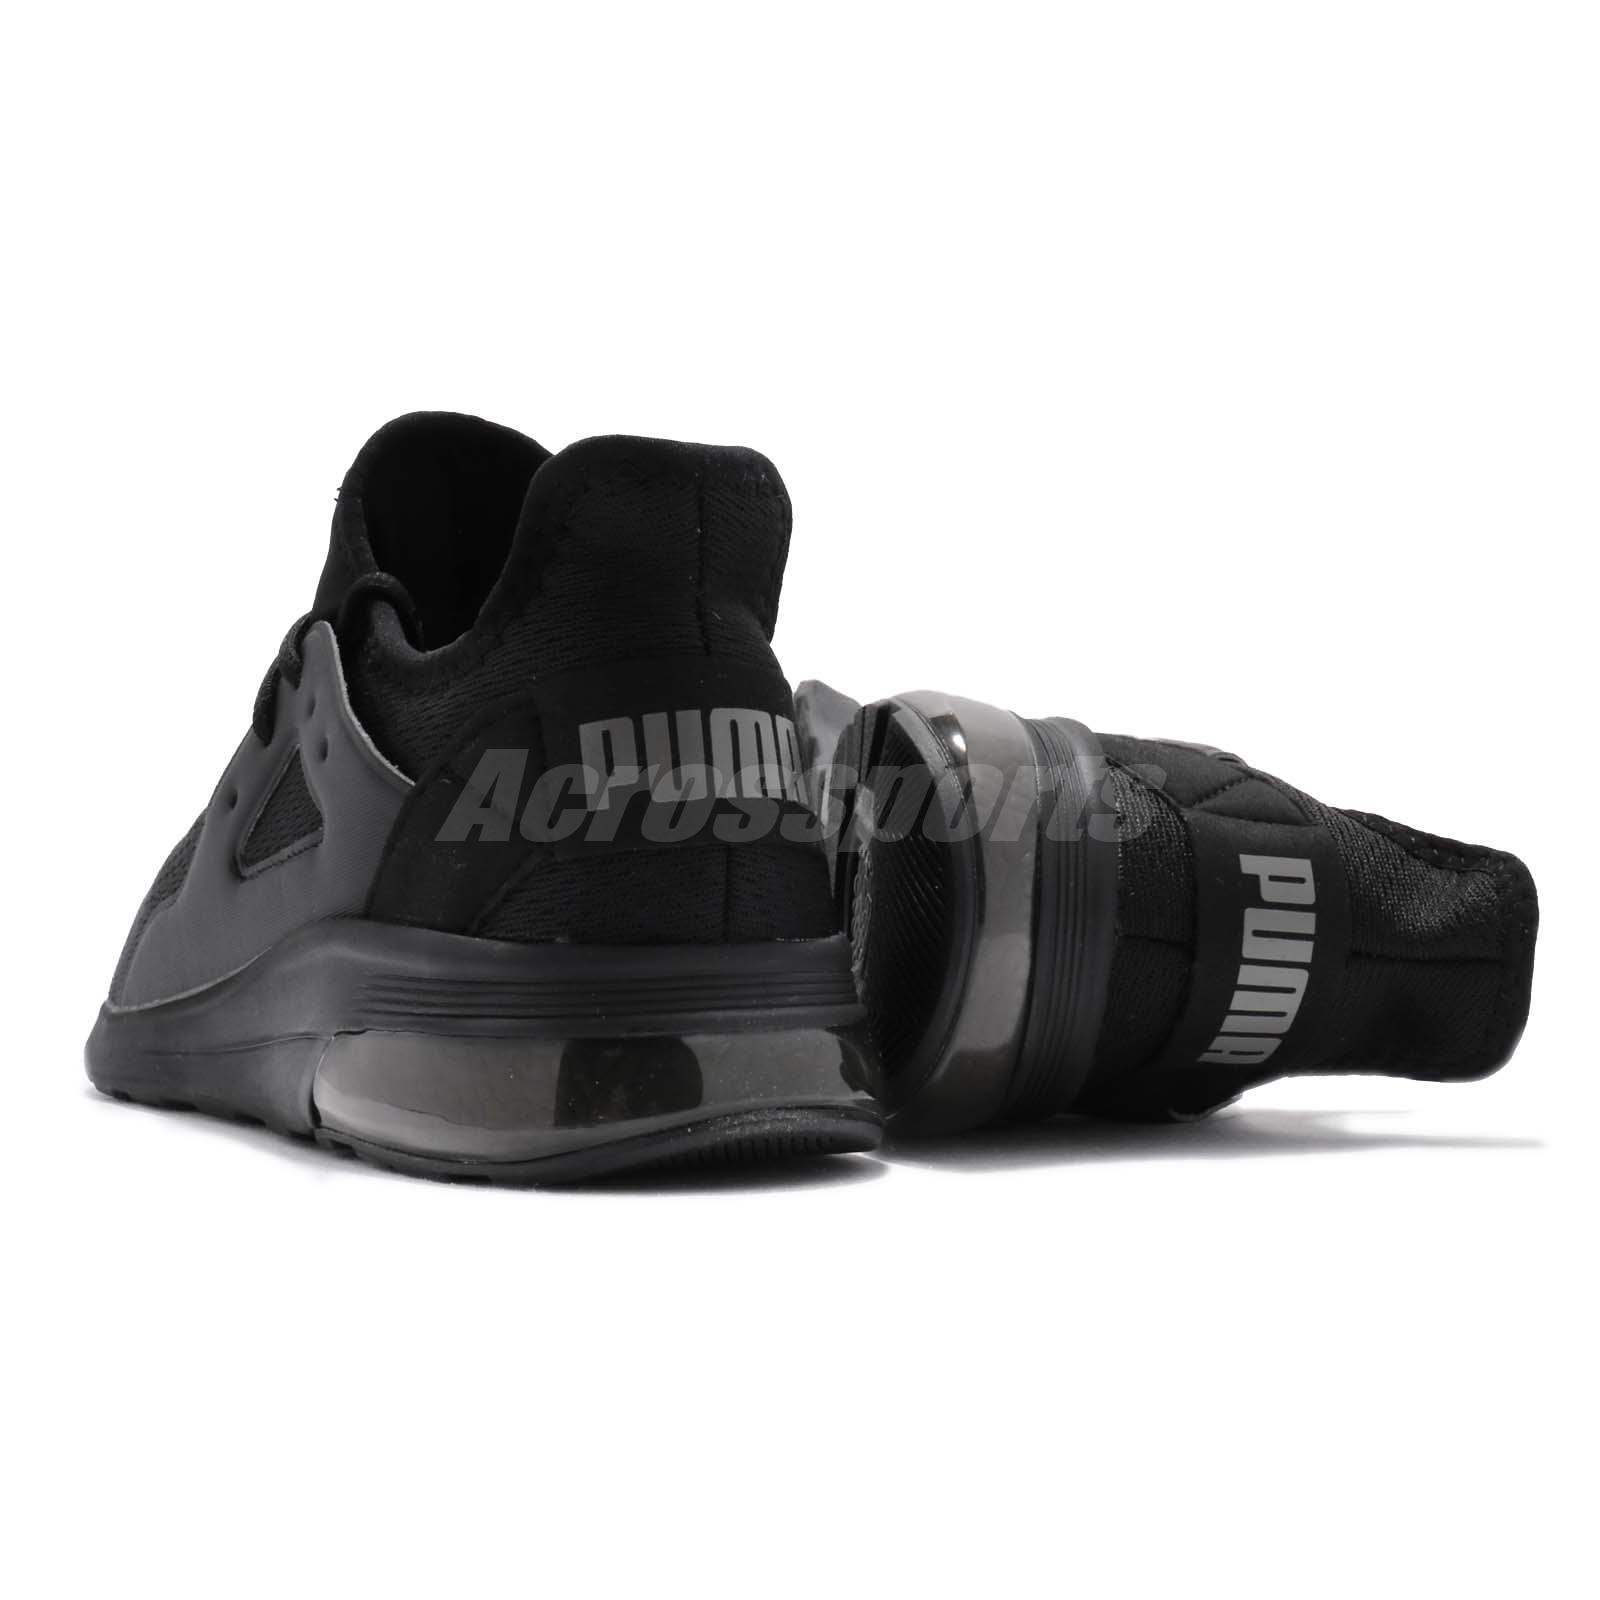 931d56a25b3 Puma Electron Street Eng Mesh Black Grey Men Running Shoes Sneakers ...